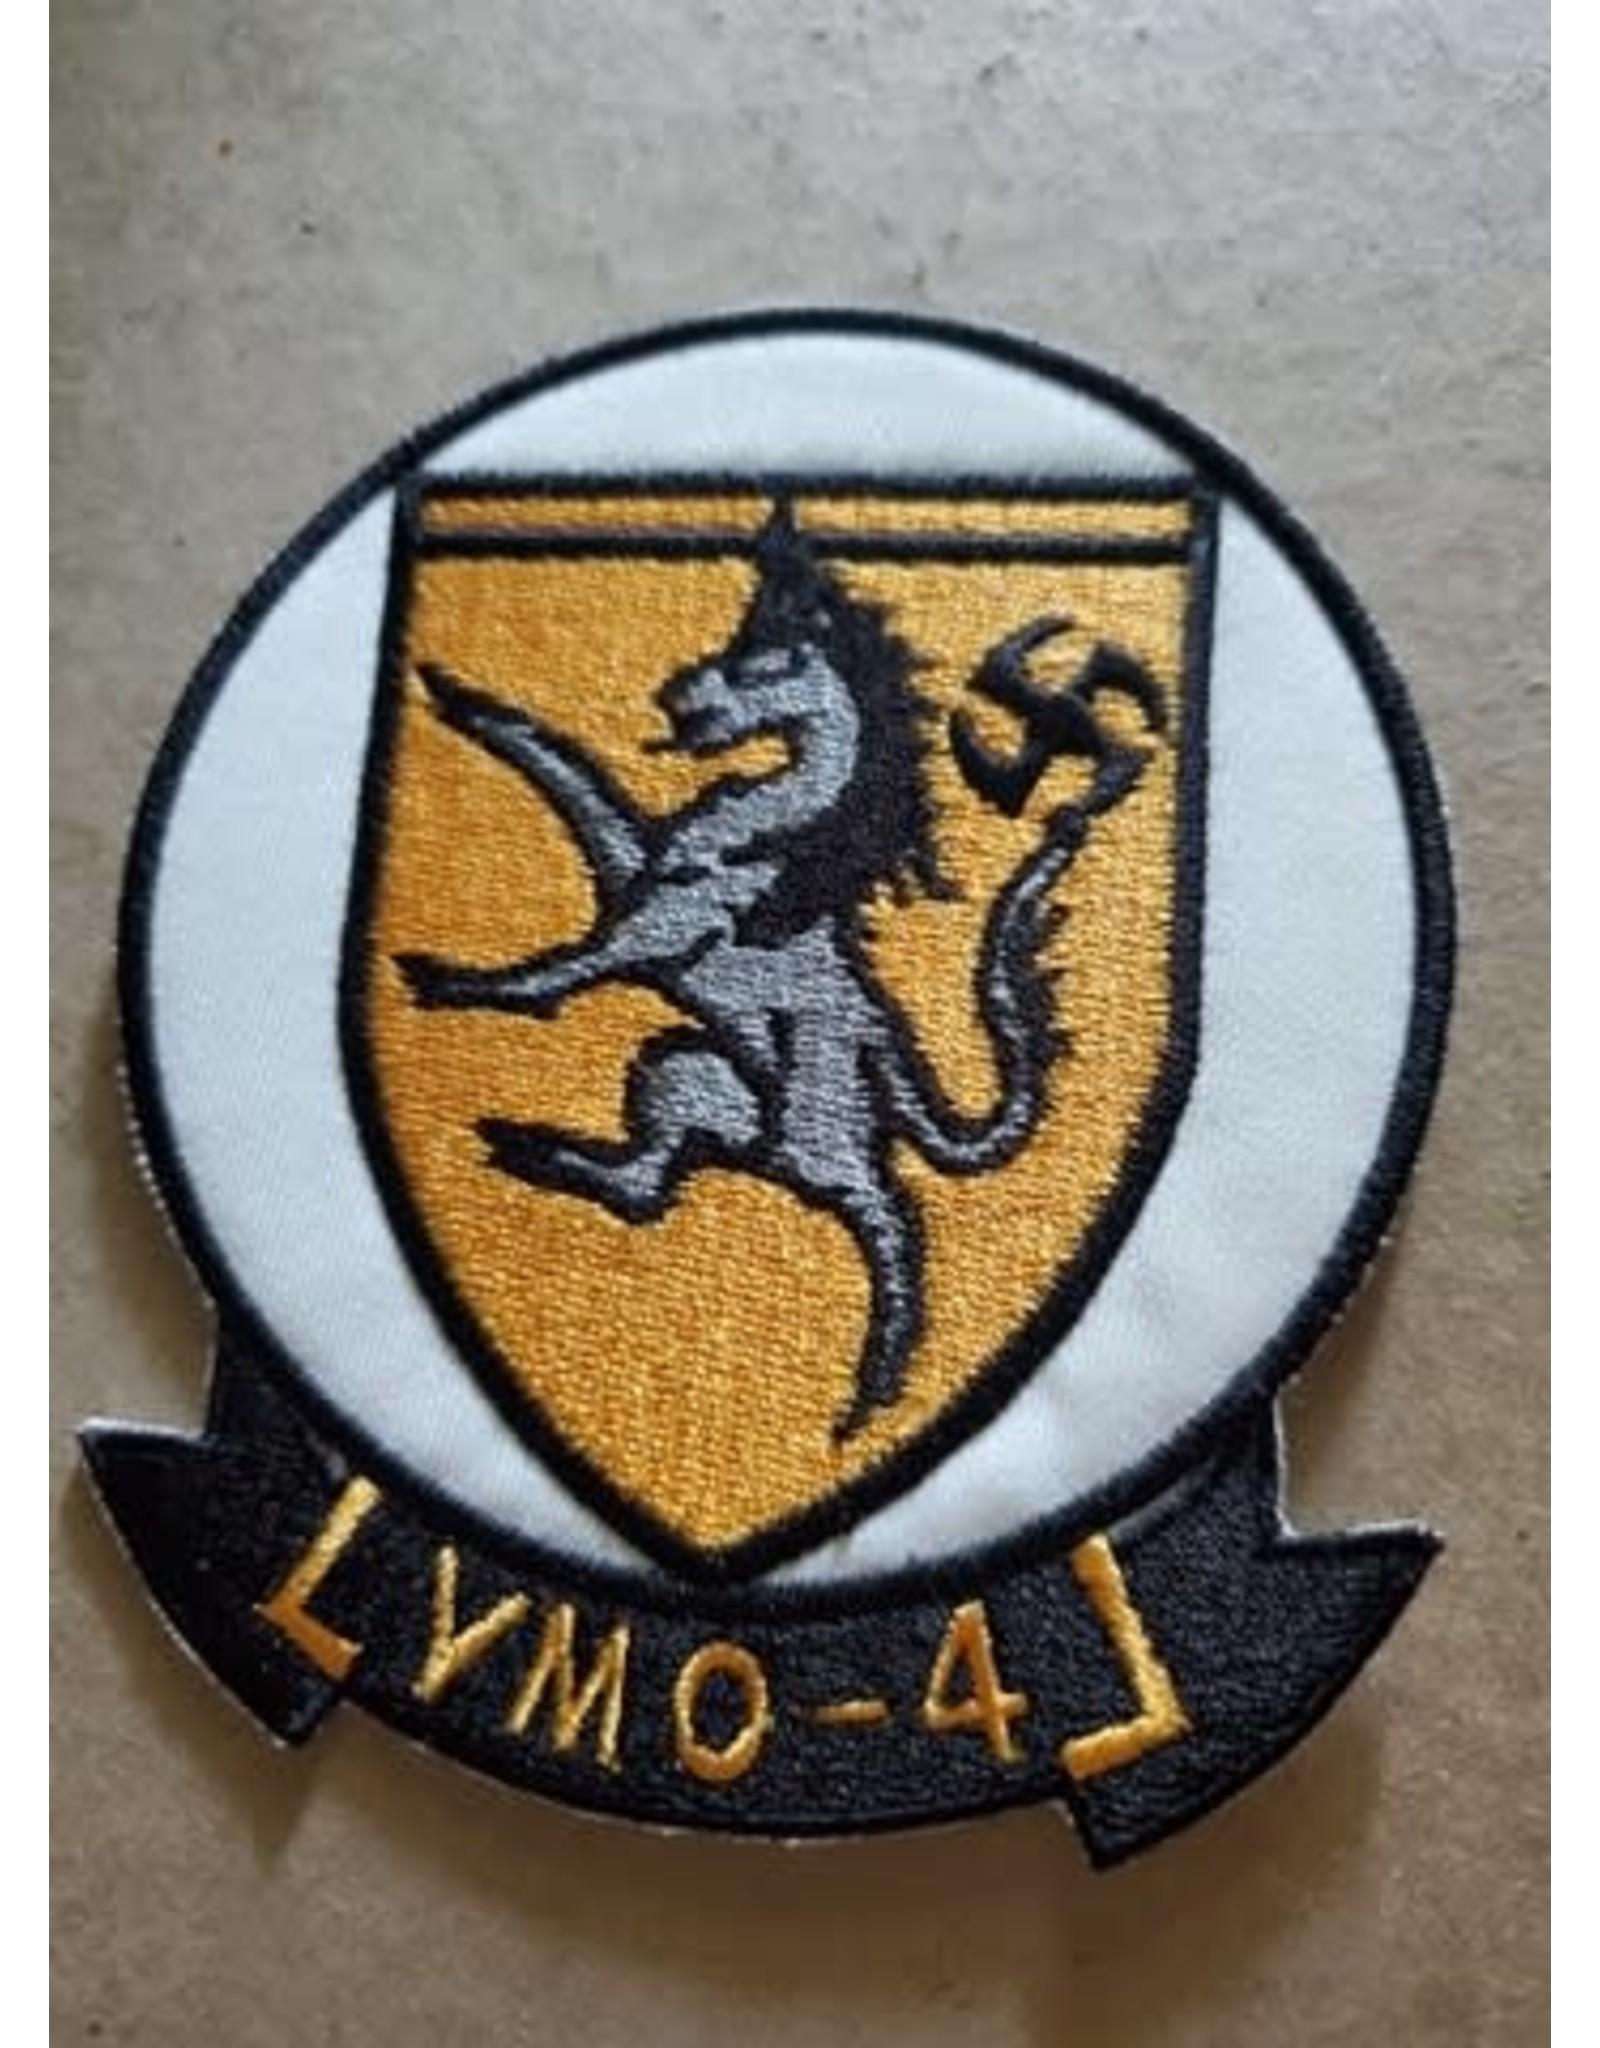 FWAM VMO-4 Shield (26), patch